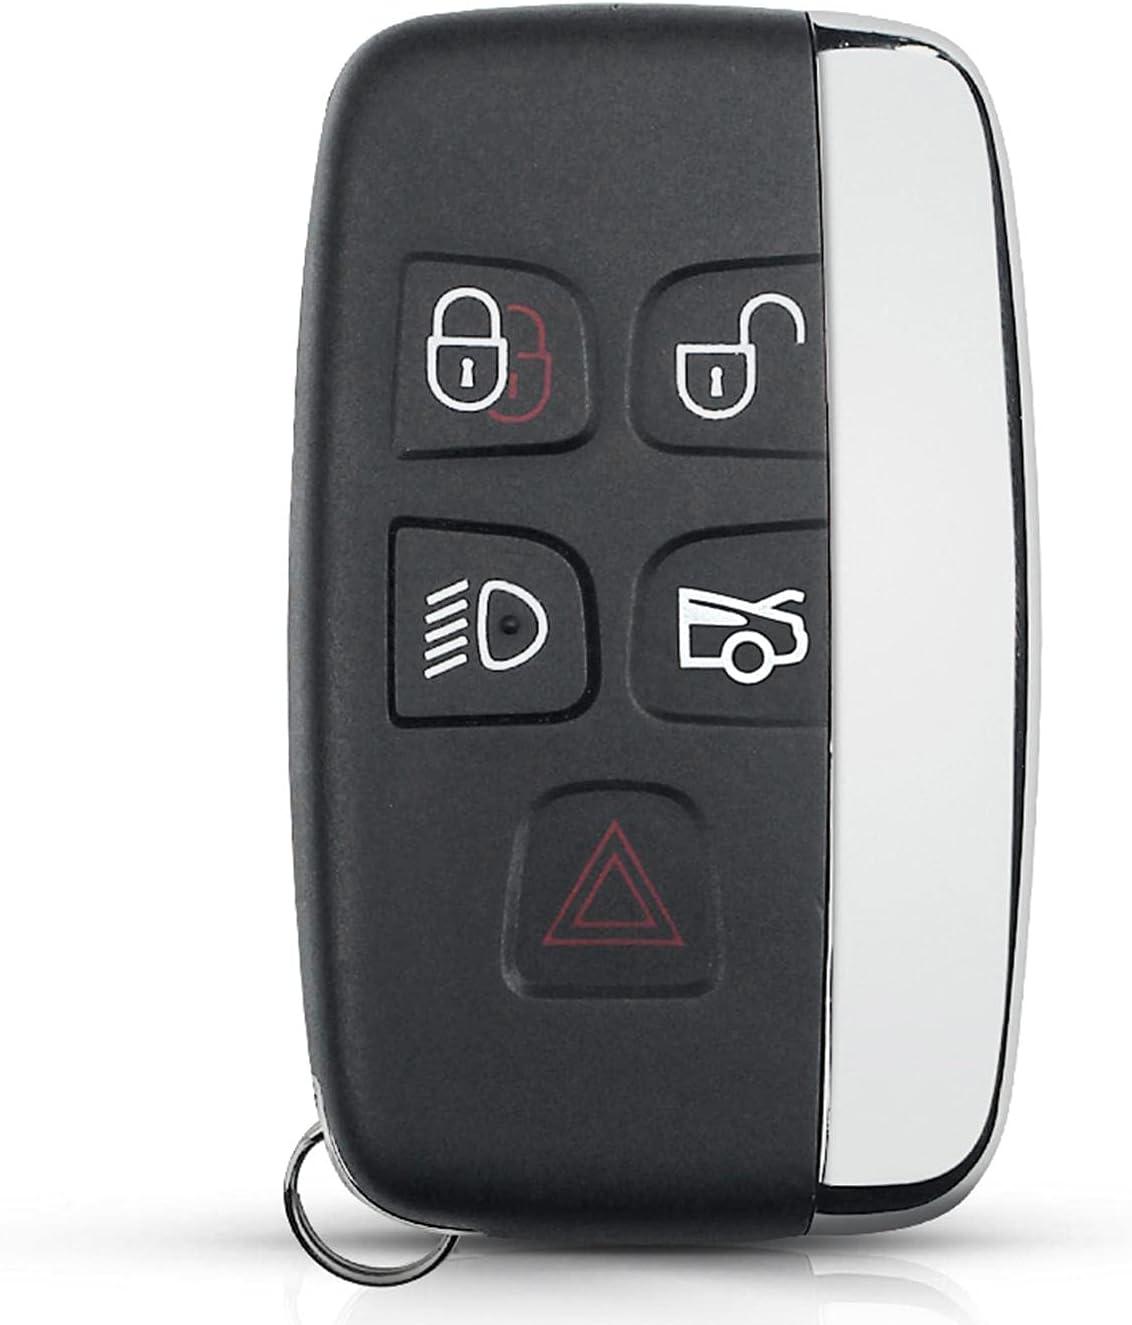 FLJKCT Car Key Shell price 5 Smart Remote f quality assurance Case Buttons